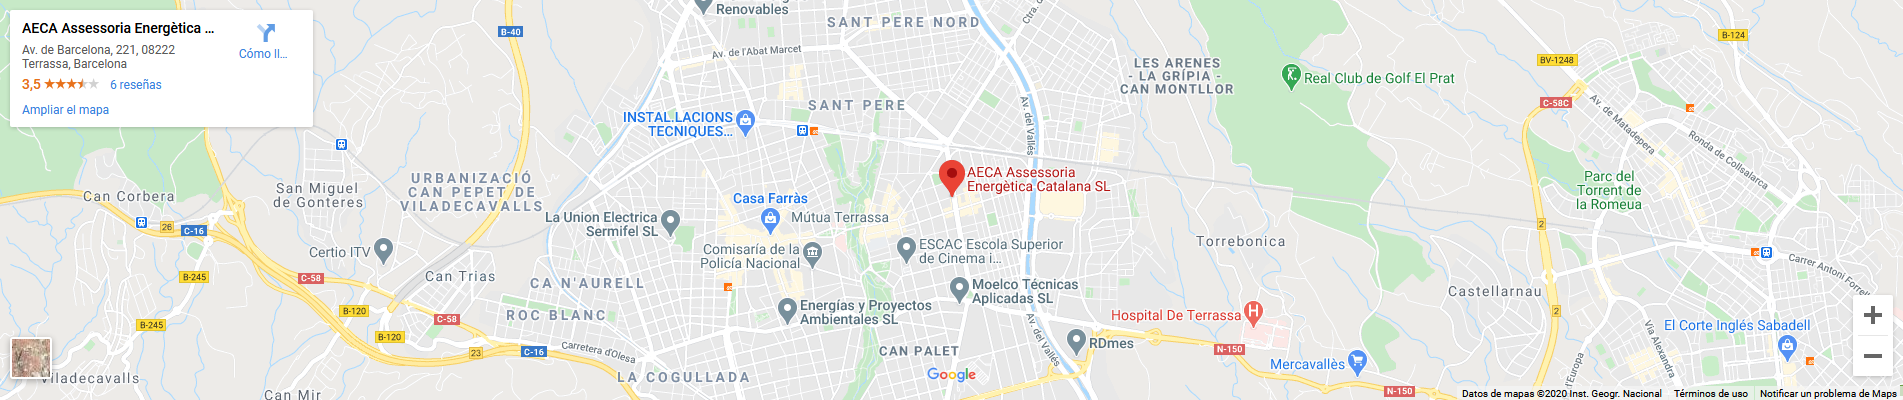 mapa-aeca